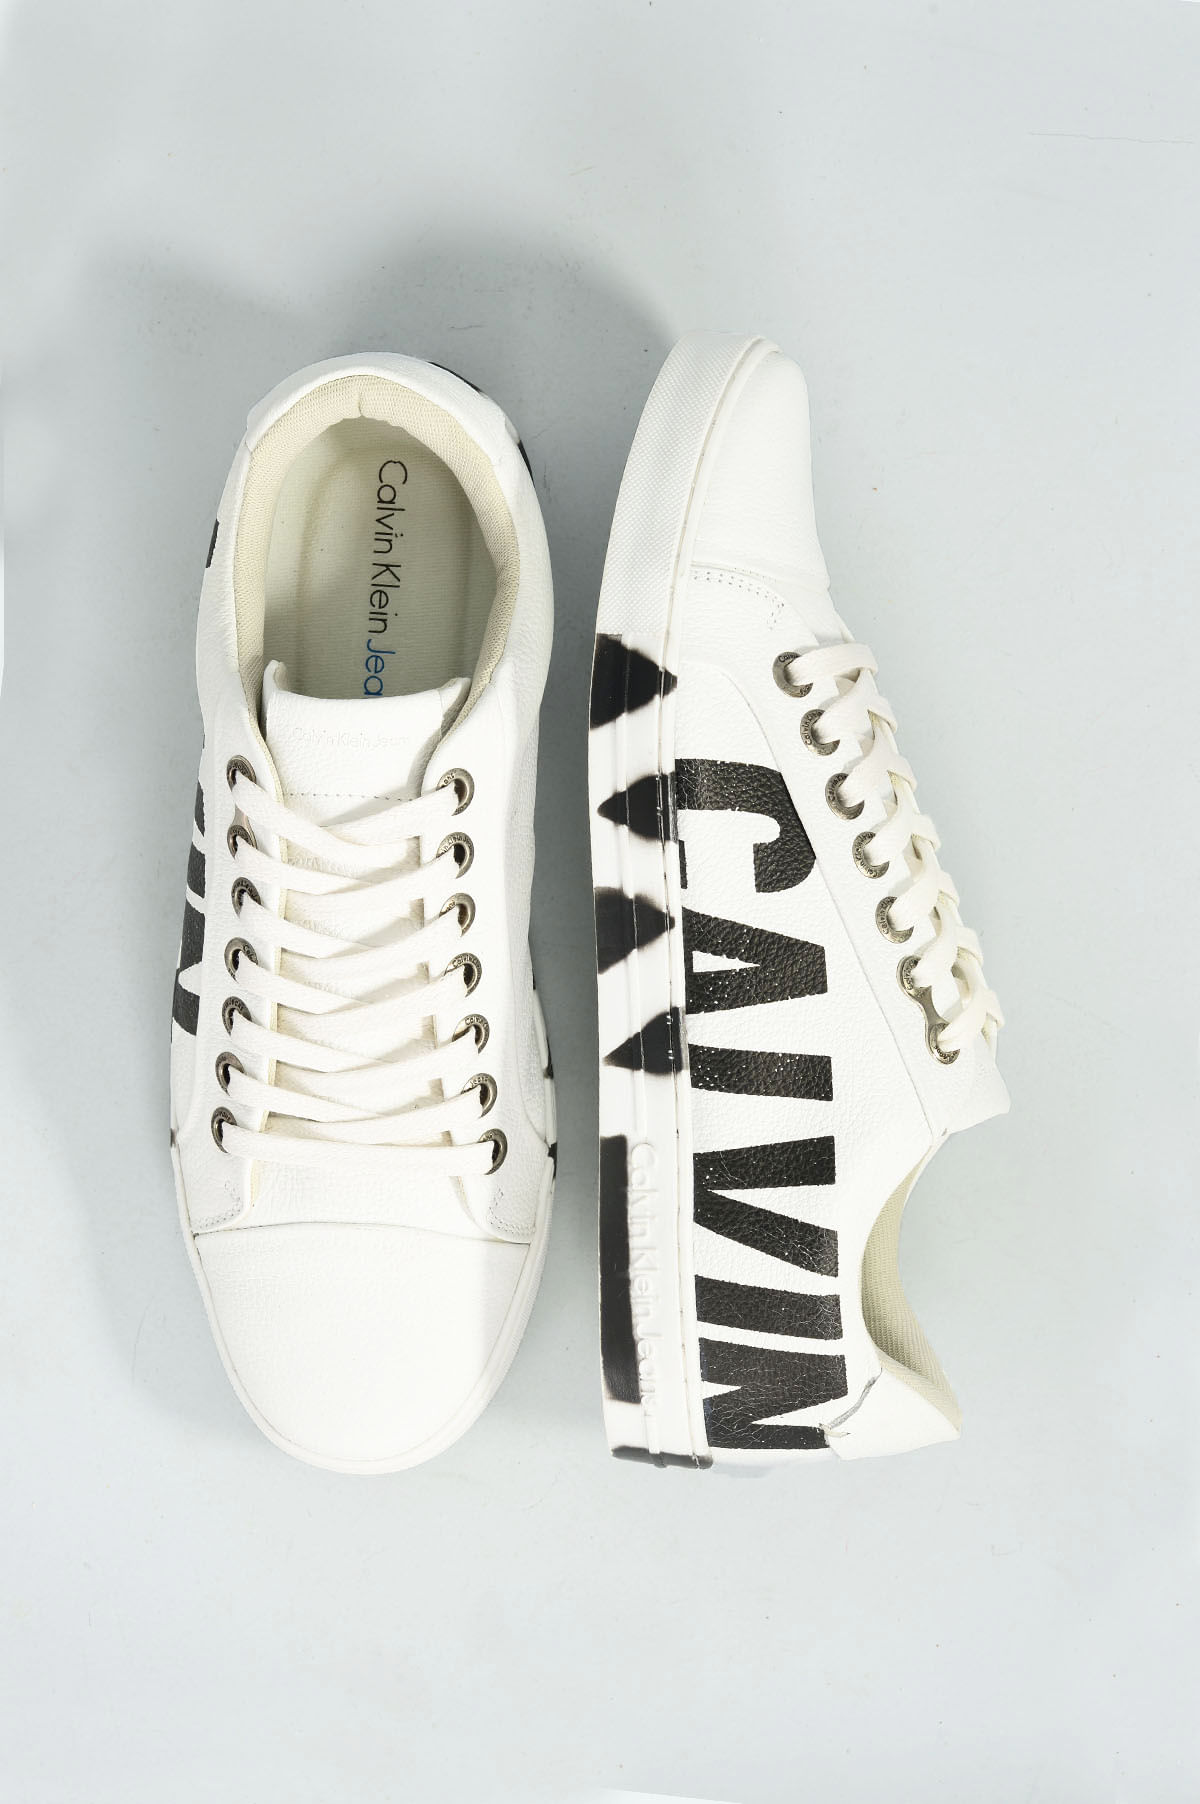 aed7bb3cd6e Sapatênis Masculino Calvin Klein Pedro CR-BRANCO - Mundial Calçados